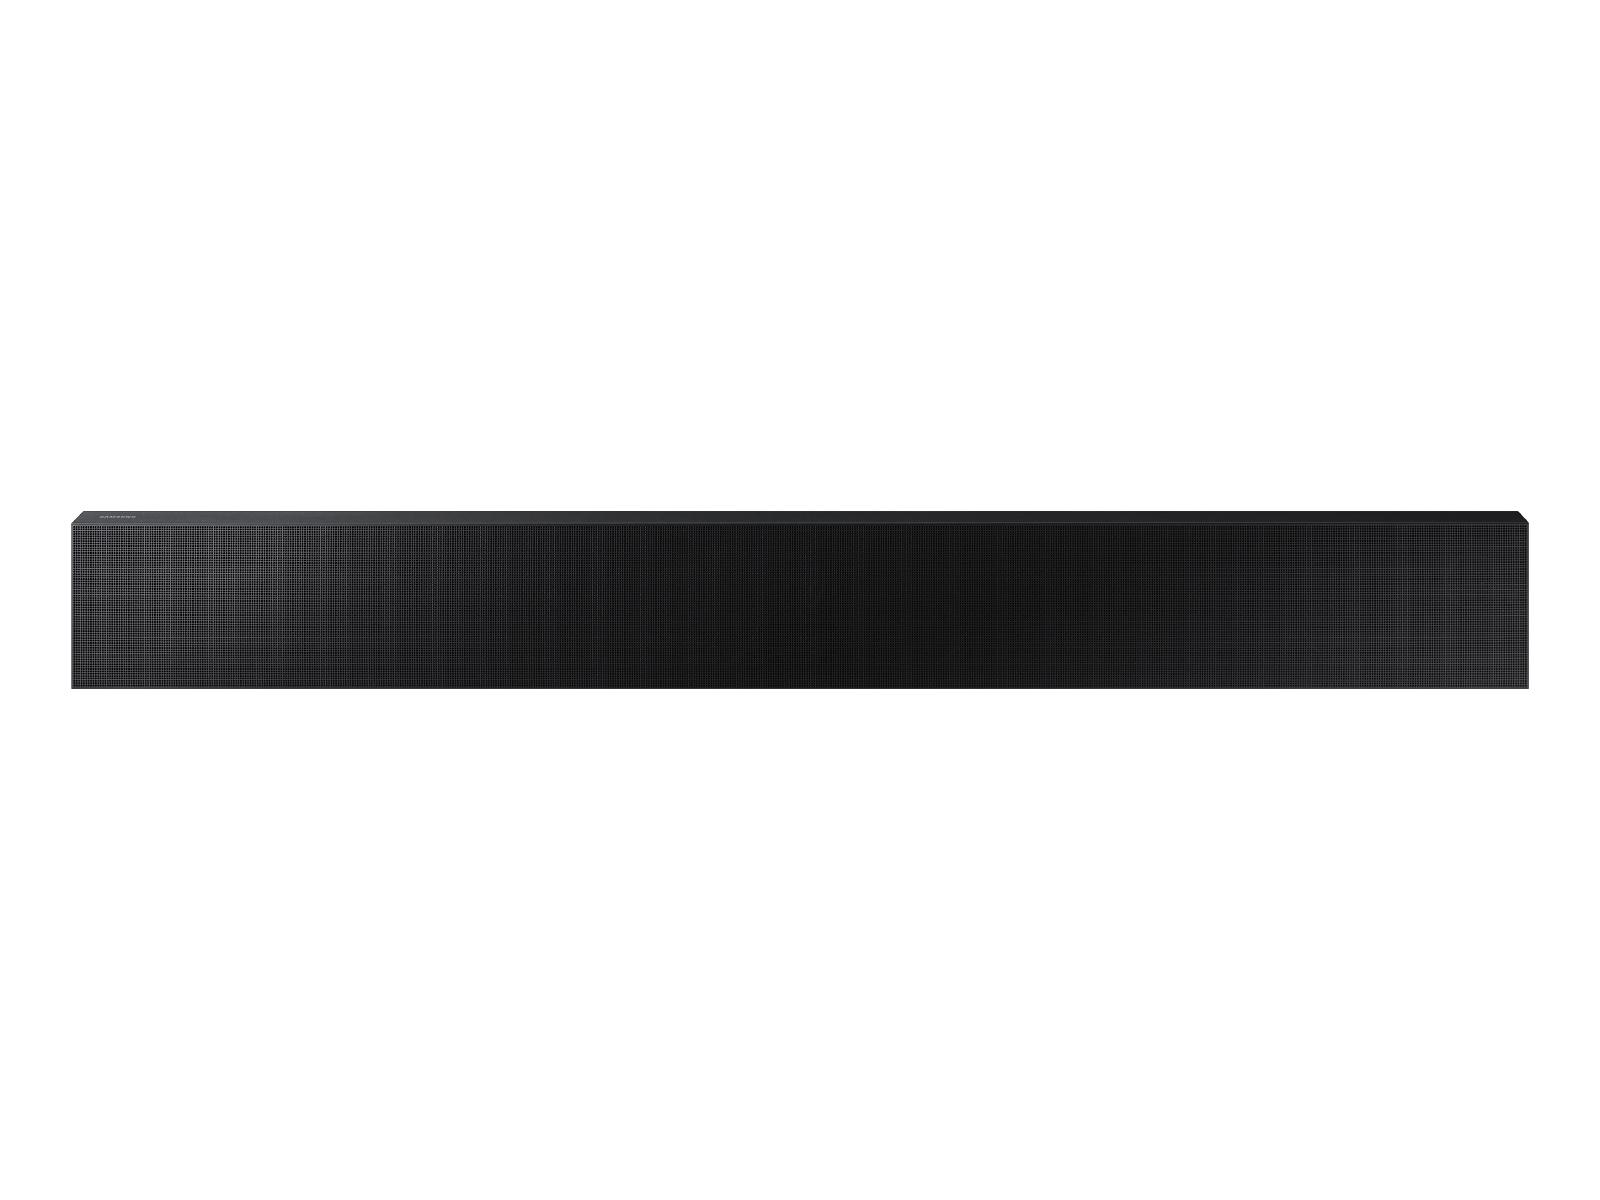 HW-LST70T 3.0ch The Terrace Soundbar w/ Dolby 5.1ch (2020)